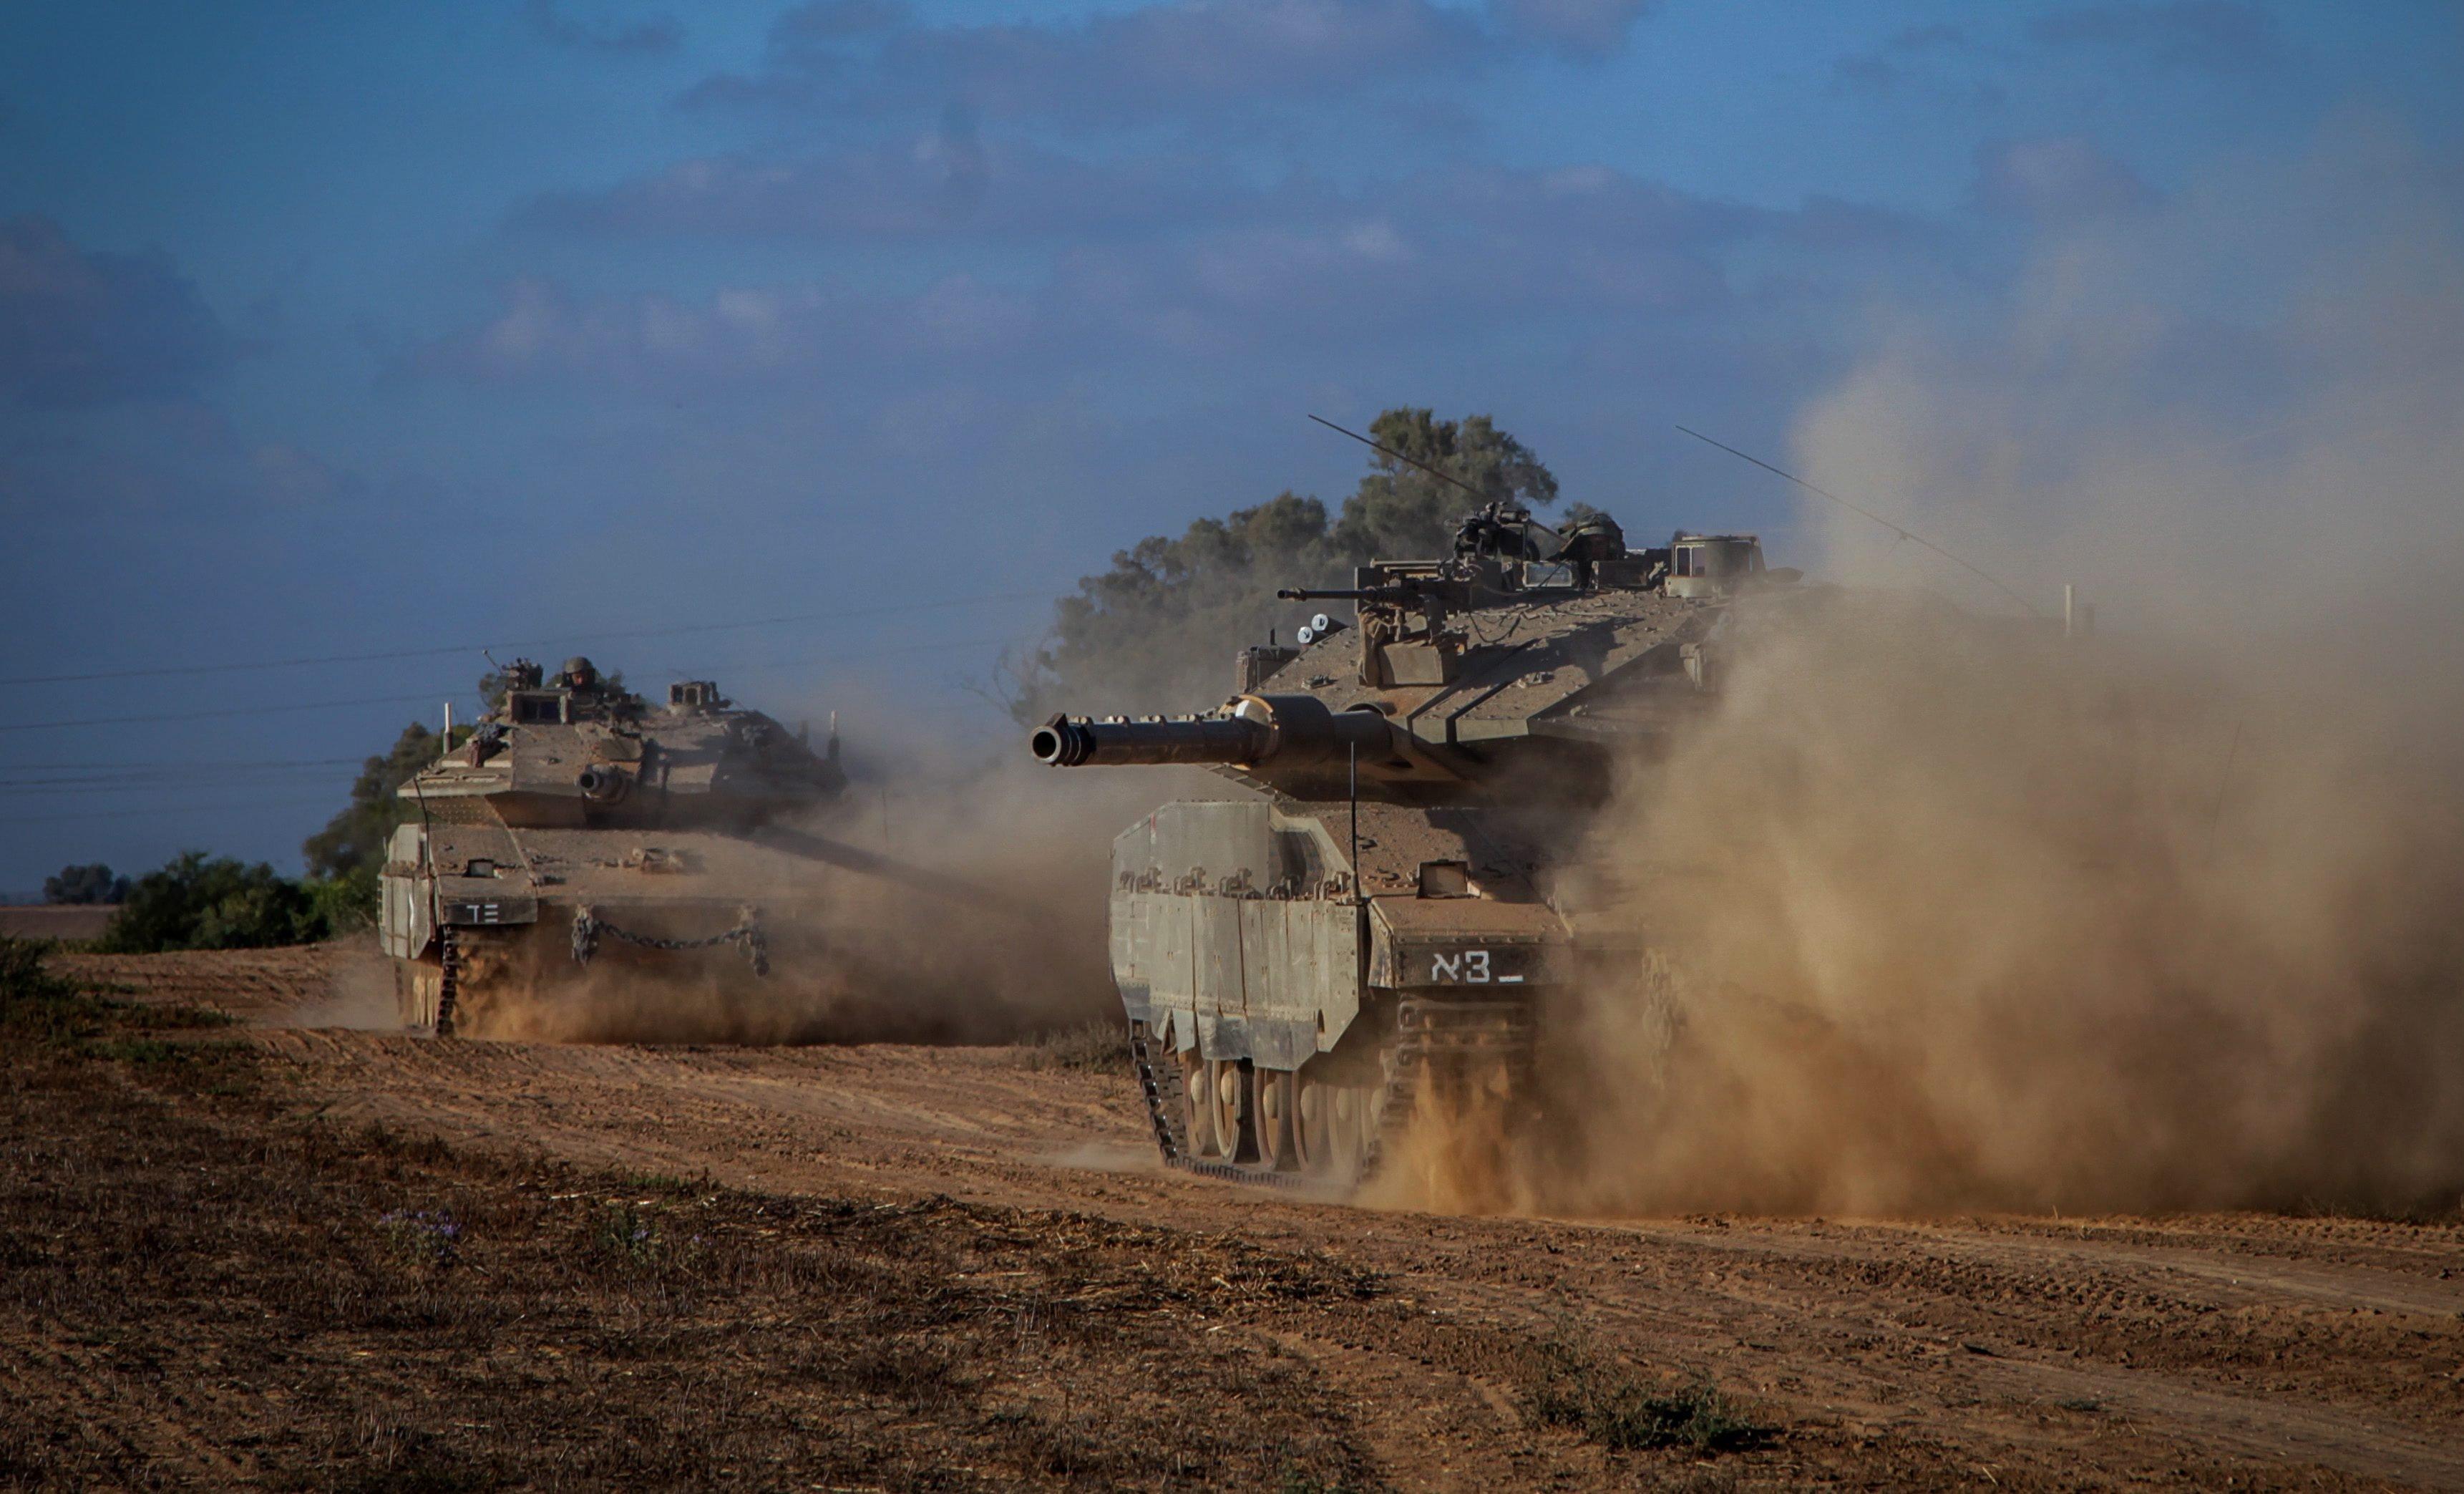 Israeli Markava tanks heading toward the Israeli-Gaza border early on July 17, 2014.